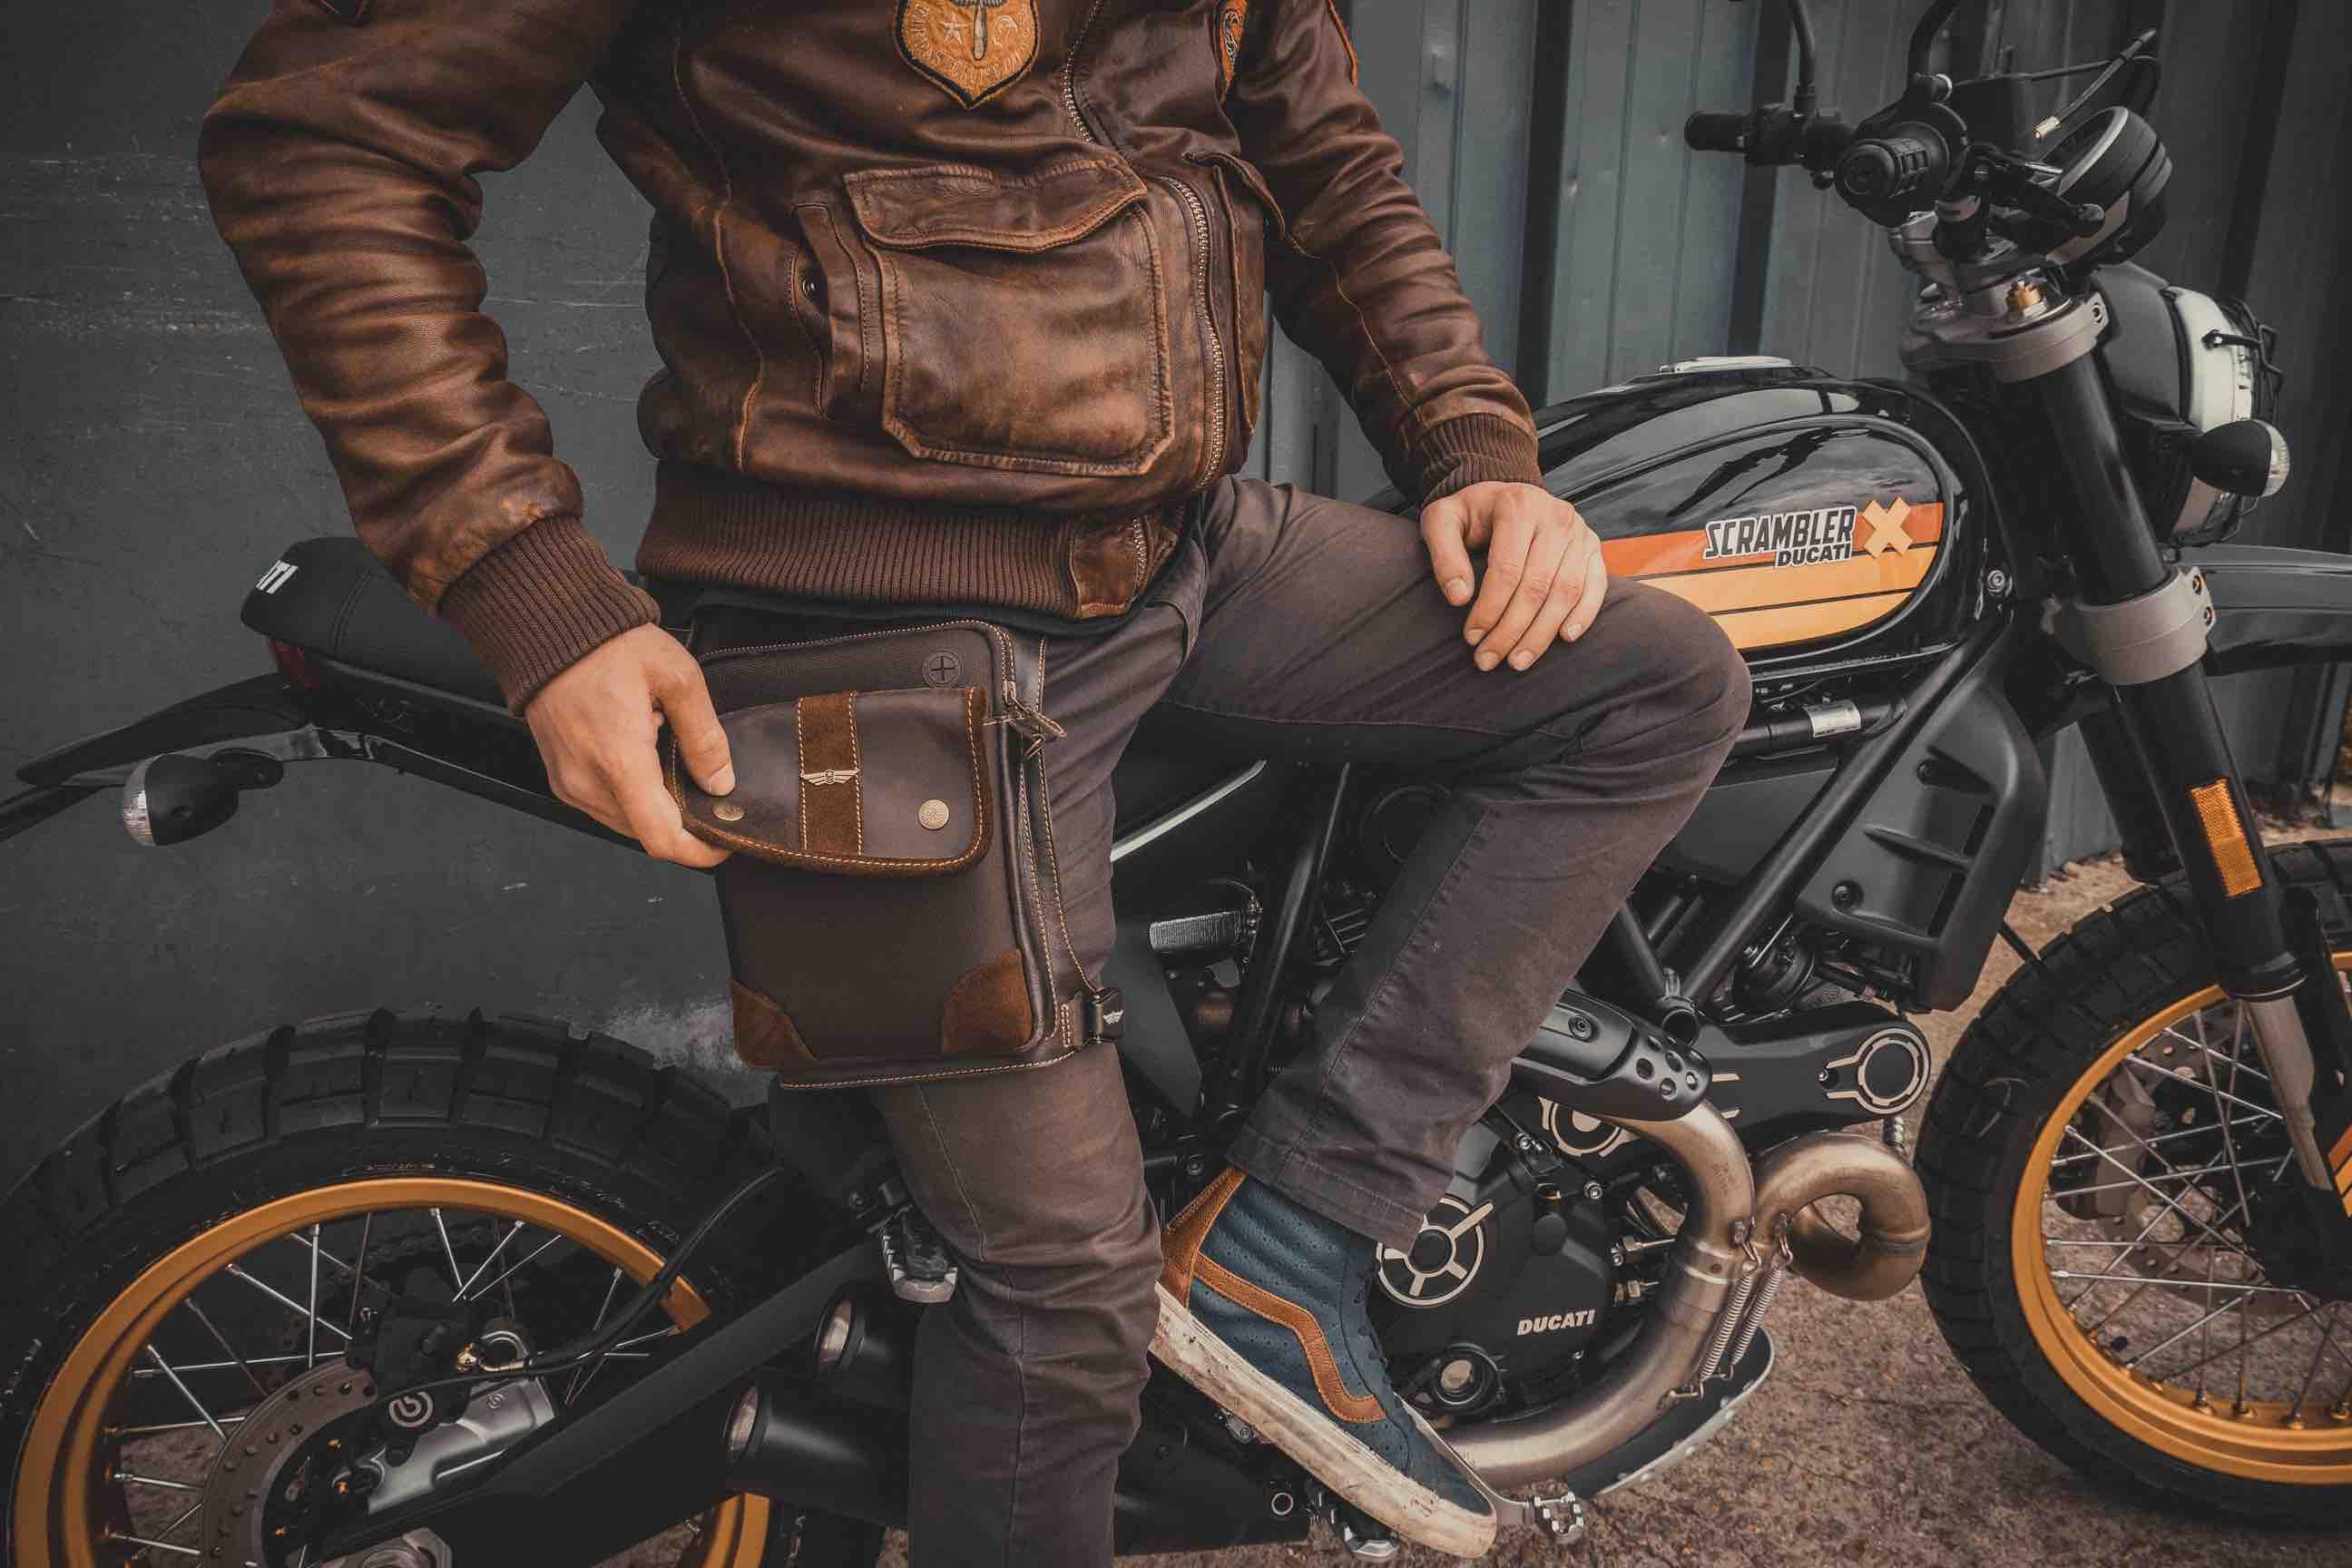 sacoches vintages en cuir moto café racer